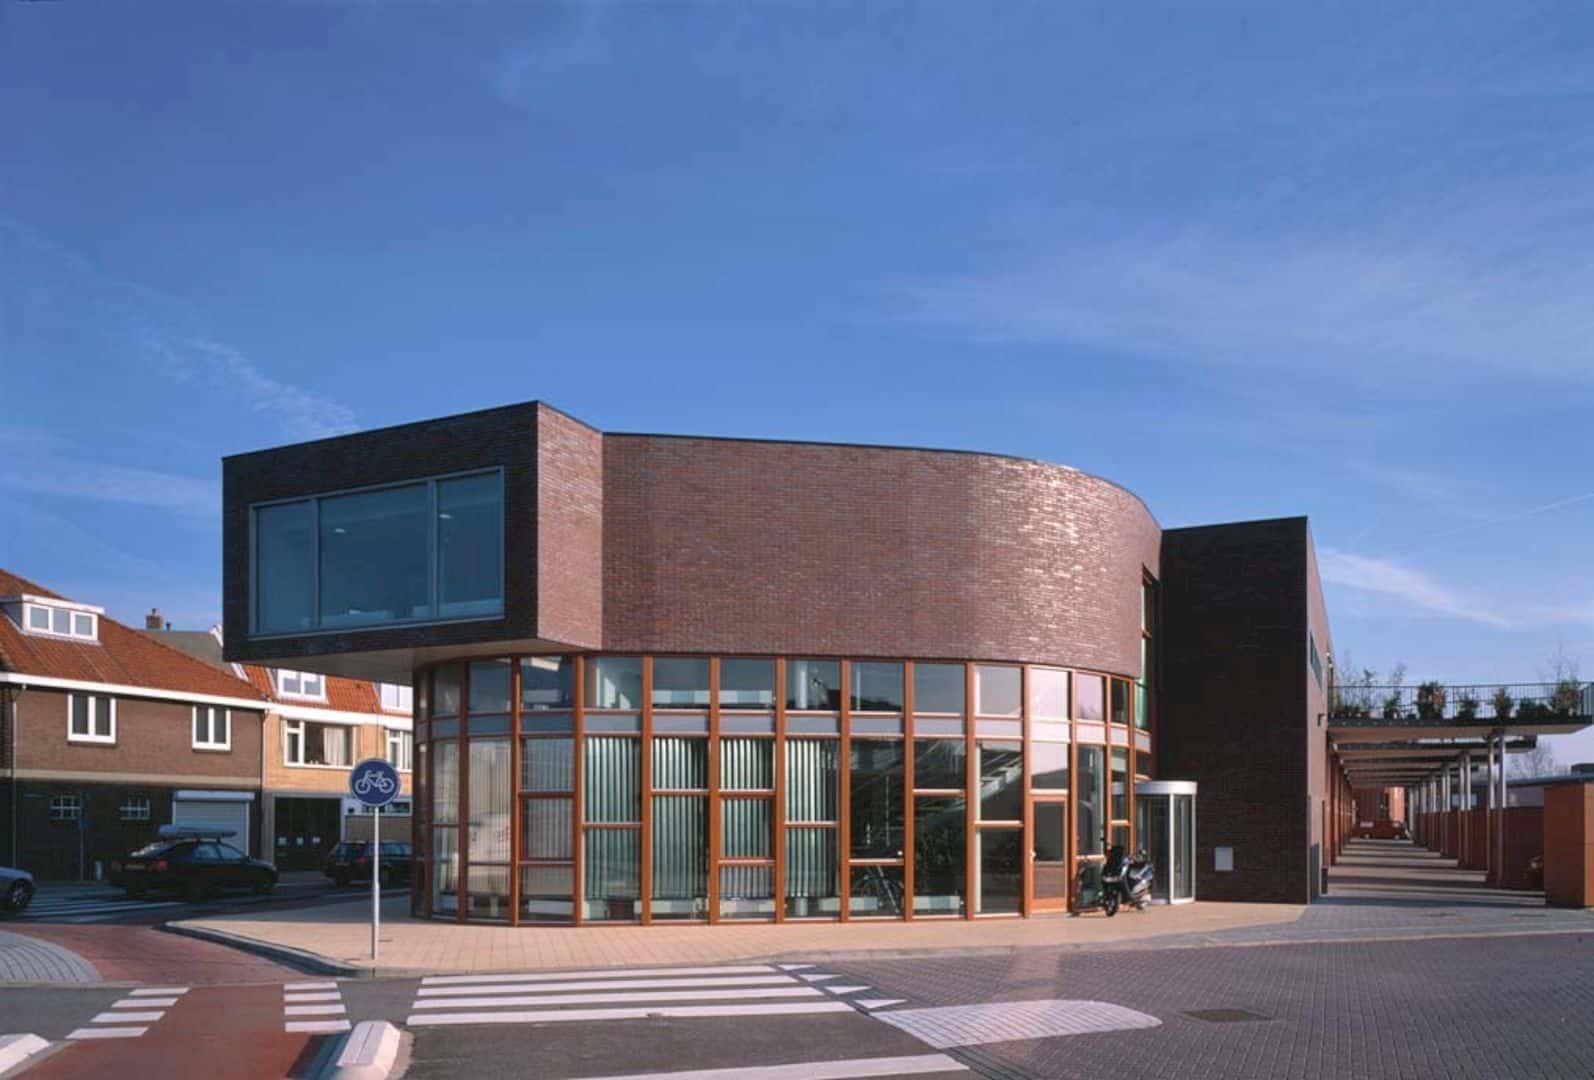 Residences ERL Site Leidschendam By Jeanne Dekkers Architectuur 5